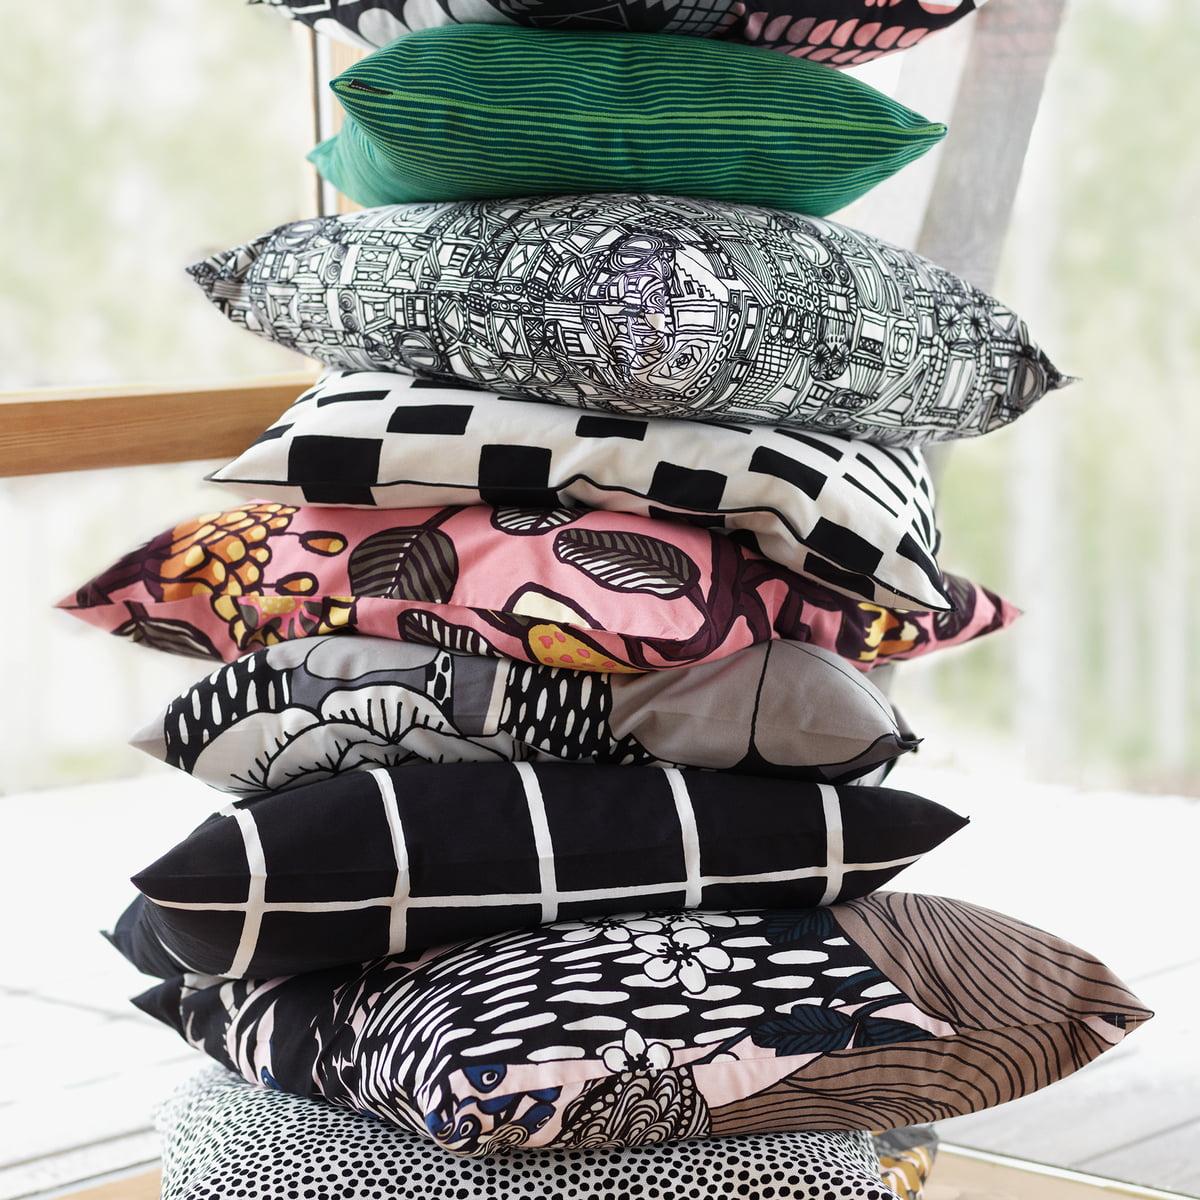 tiiliskivi kissenbezug 40 x 60 cm von marimekko. Black Bedroom Furniture Sets. Home Design Ideas